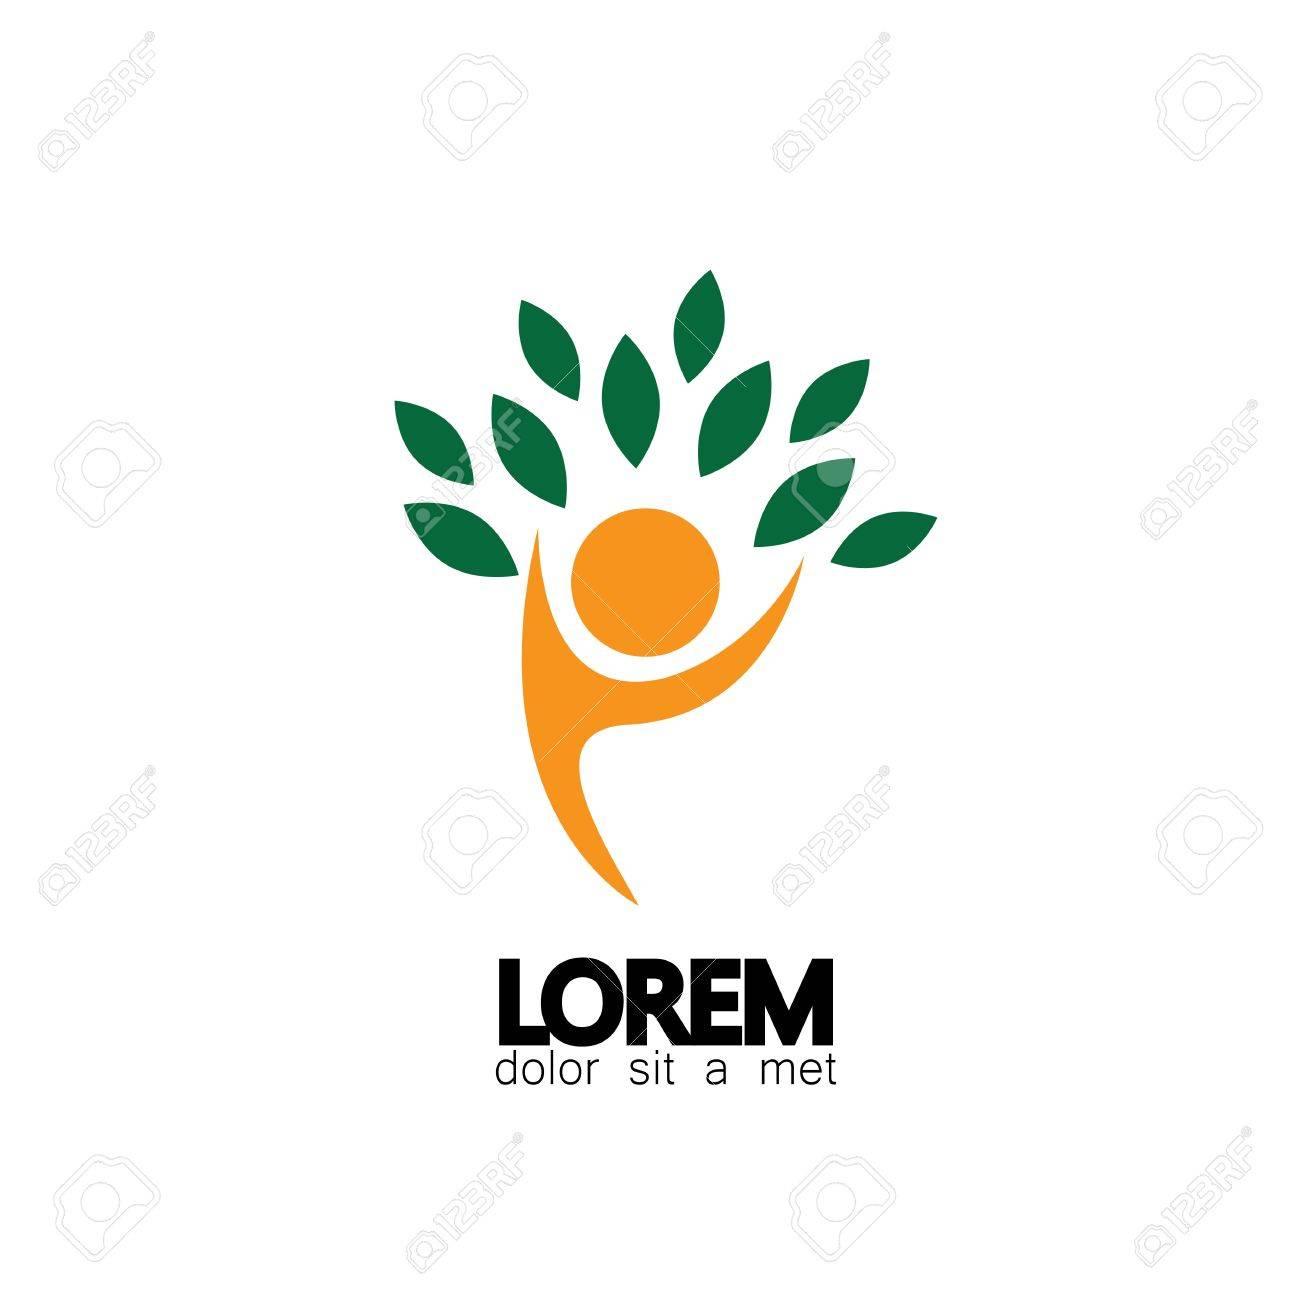 Baum Person Logo Symbol Vektor öko Freundlich Grün Umarmen Umarmen